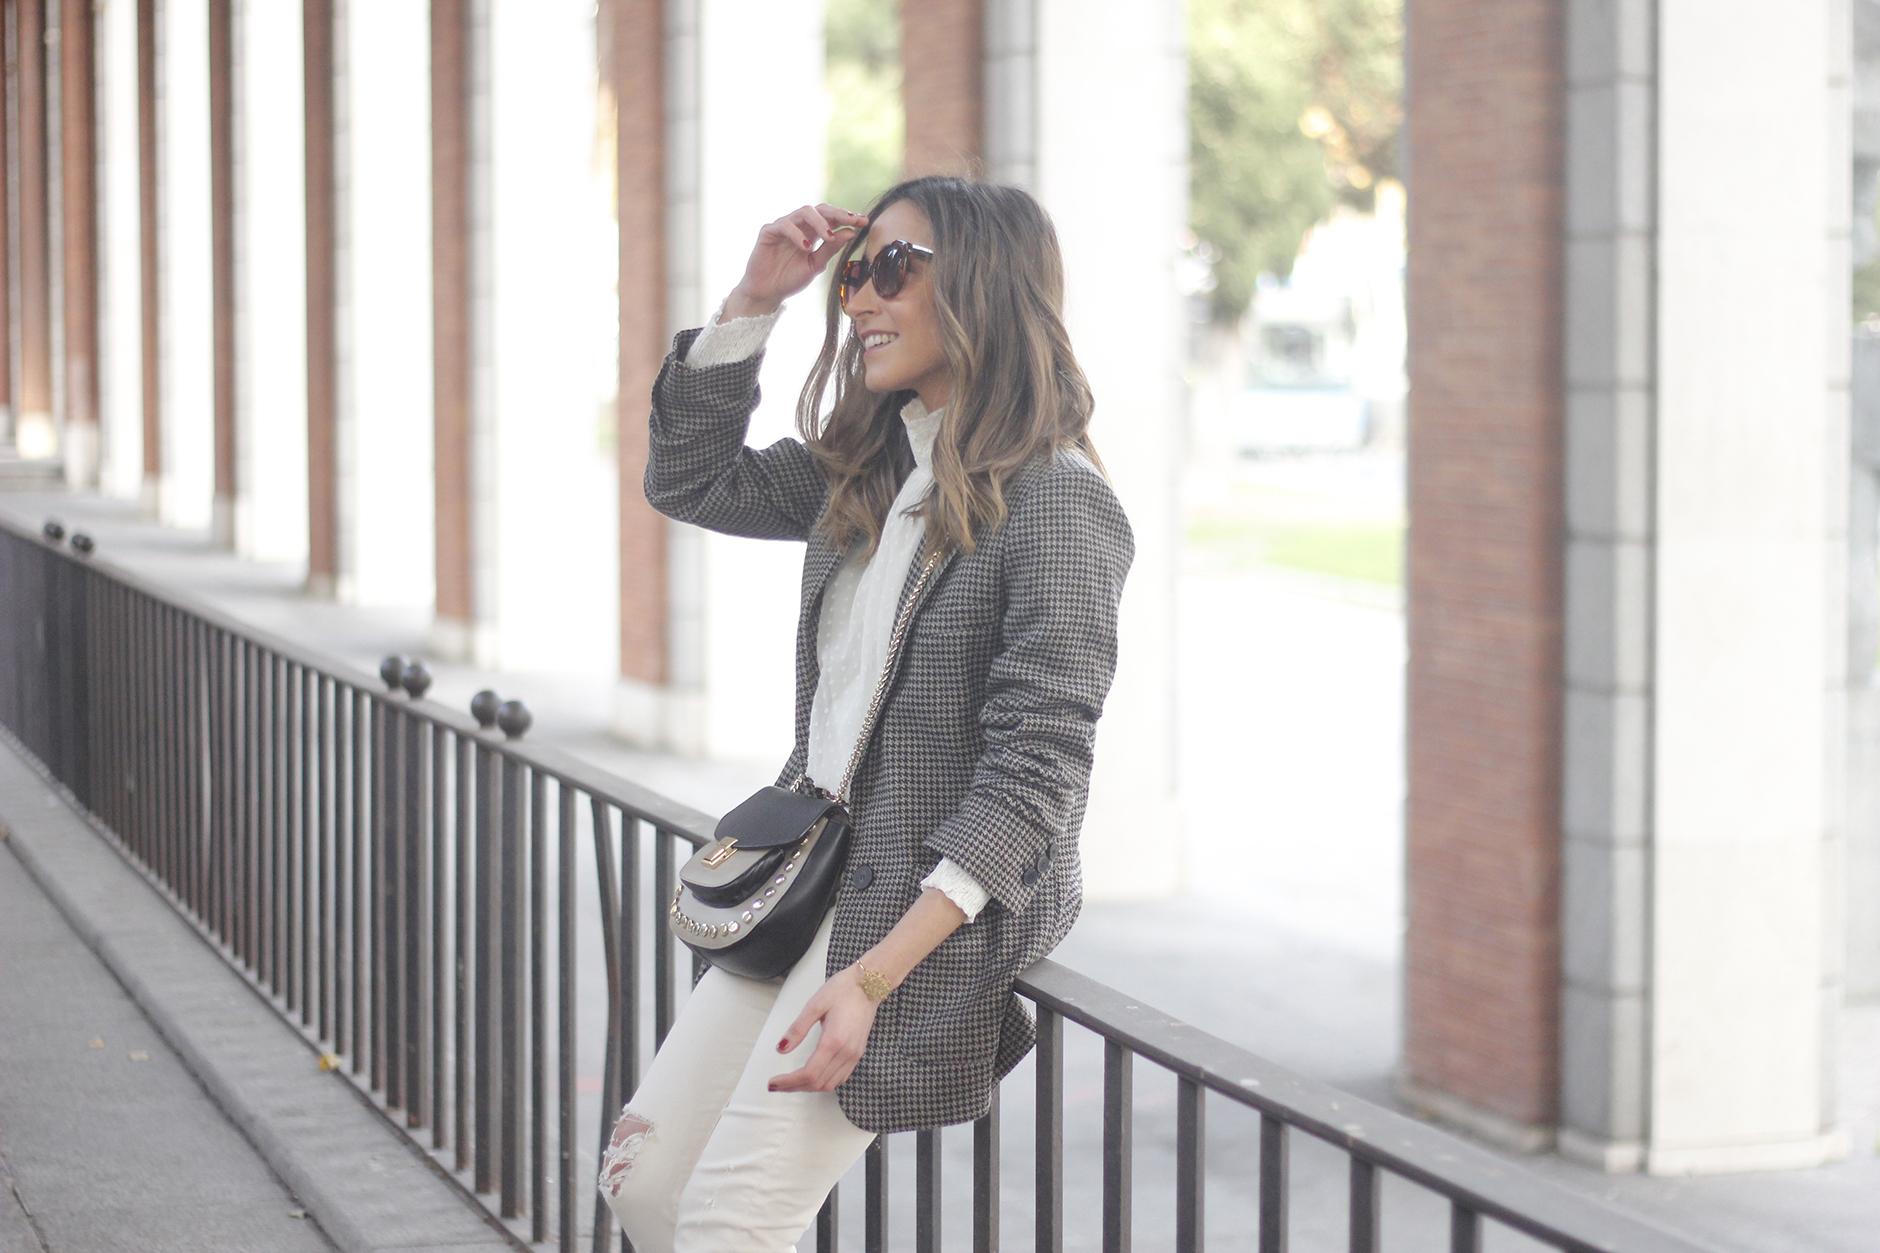 Plumeti blouse houndstooth blazer white jeans outfit style streetstyle05